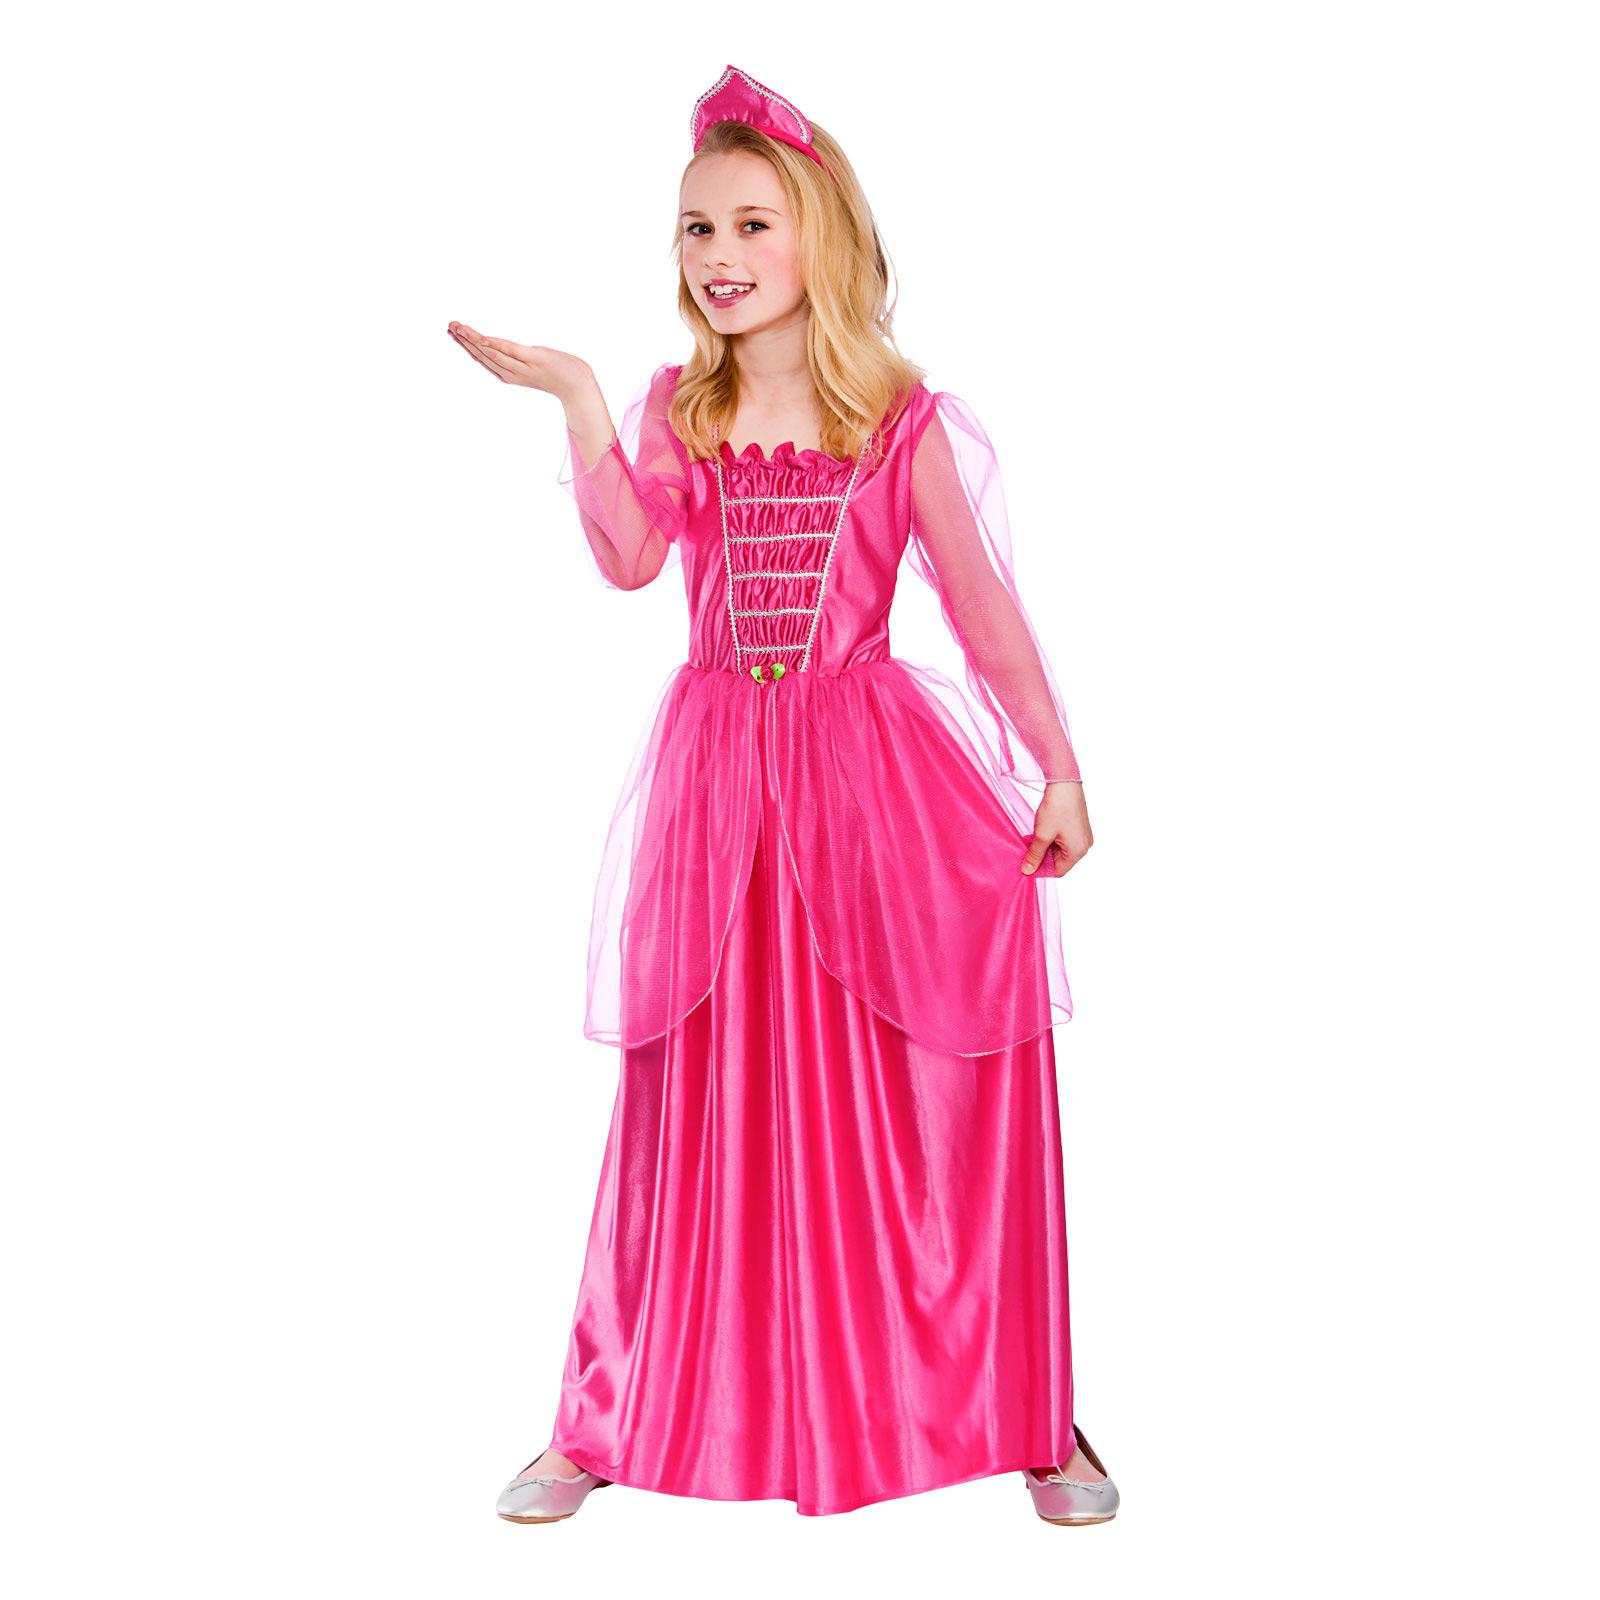 Halloween Girls Princess Fancy Dress Up Costume Outfits: Girls Darling Princess Fancy Dress Up Party Costume